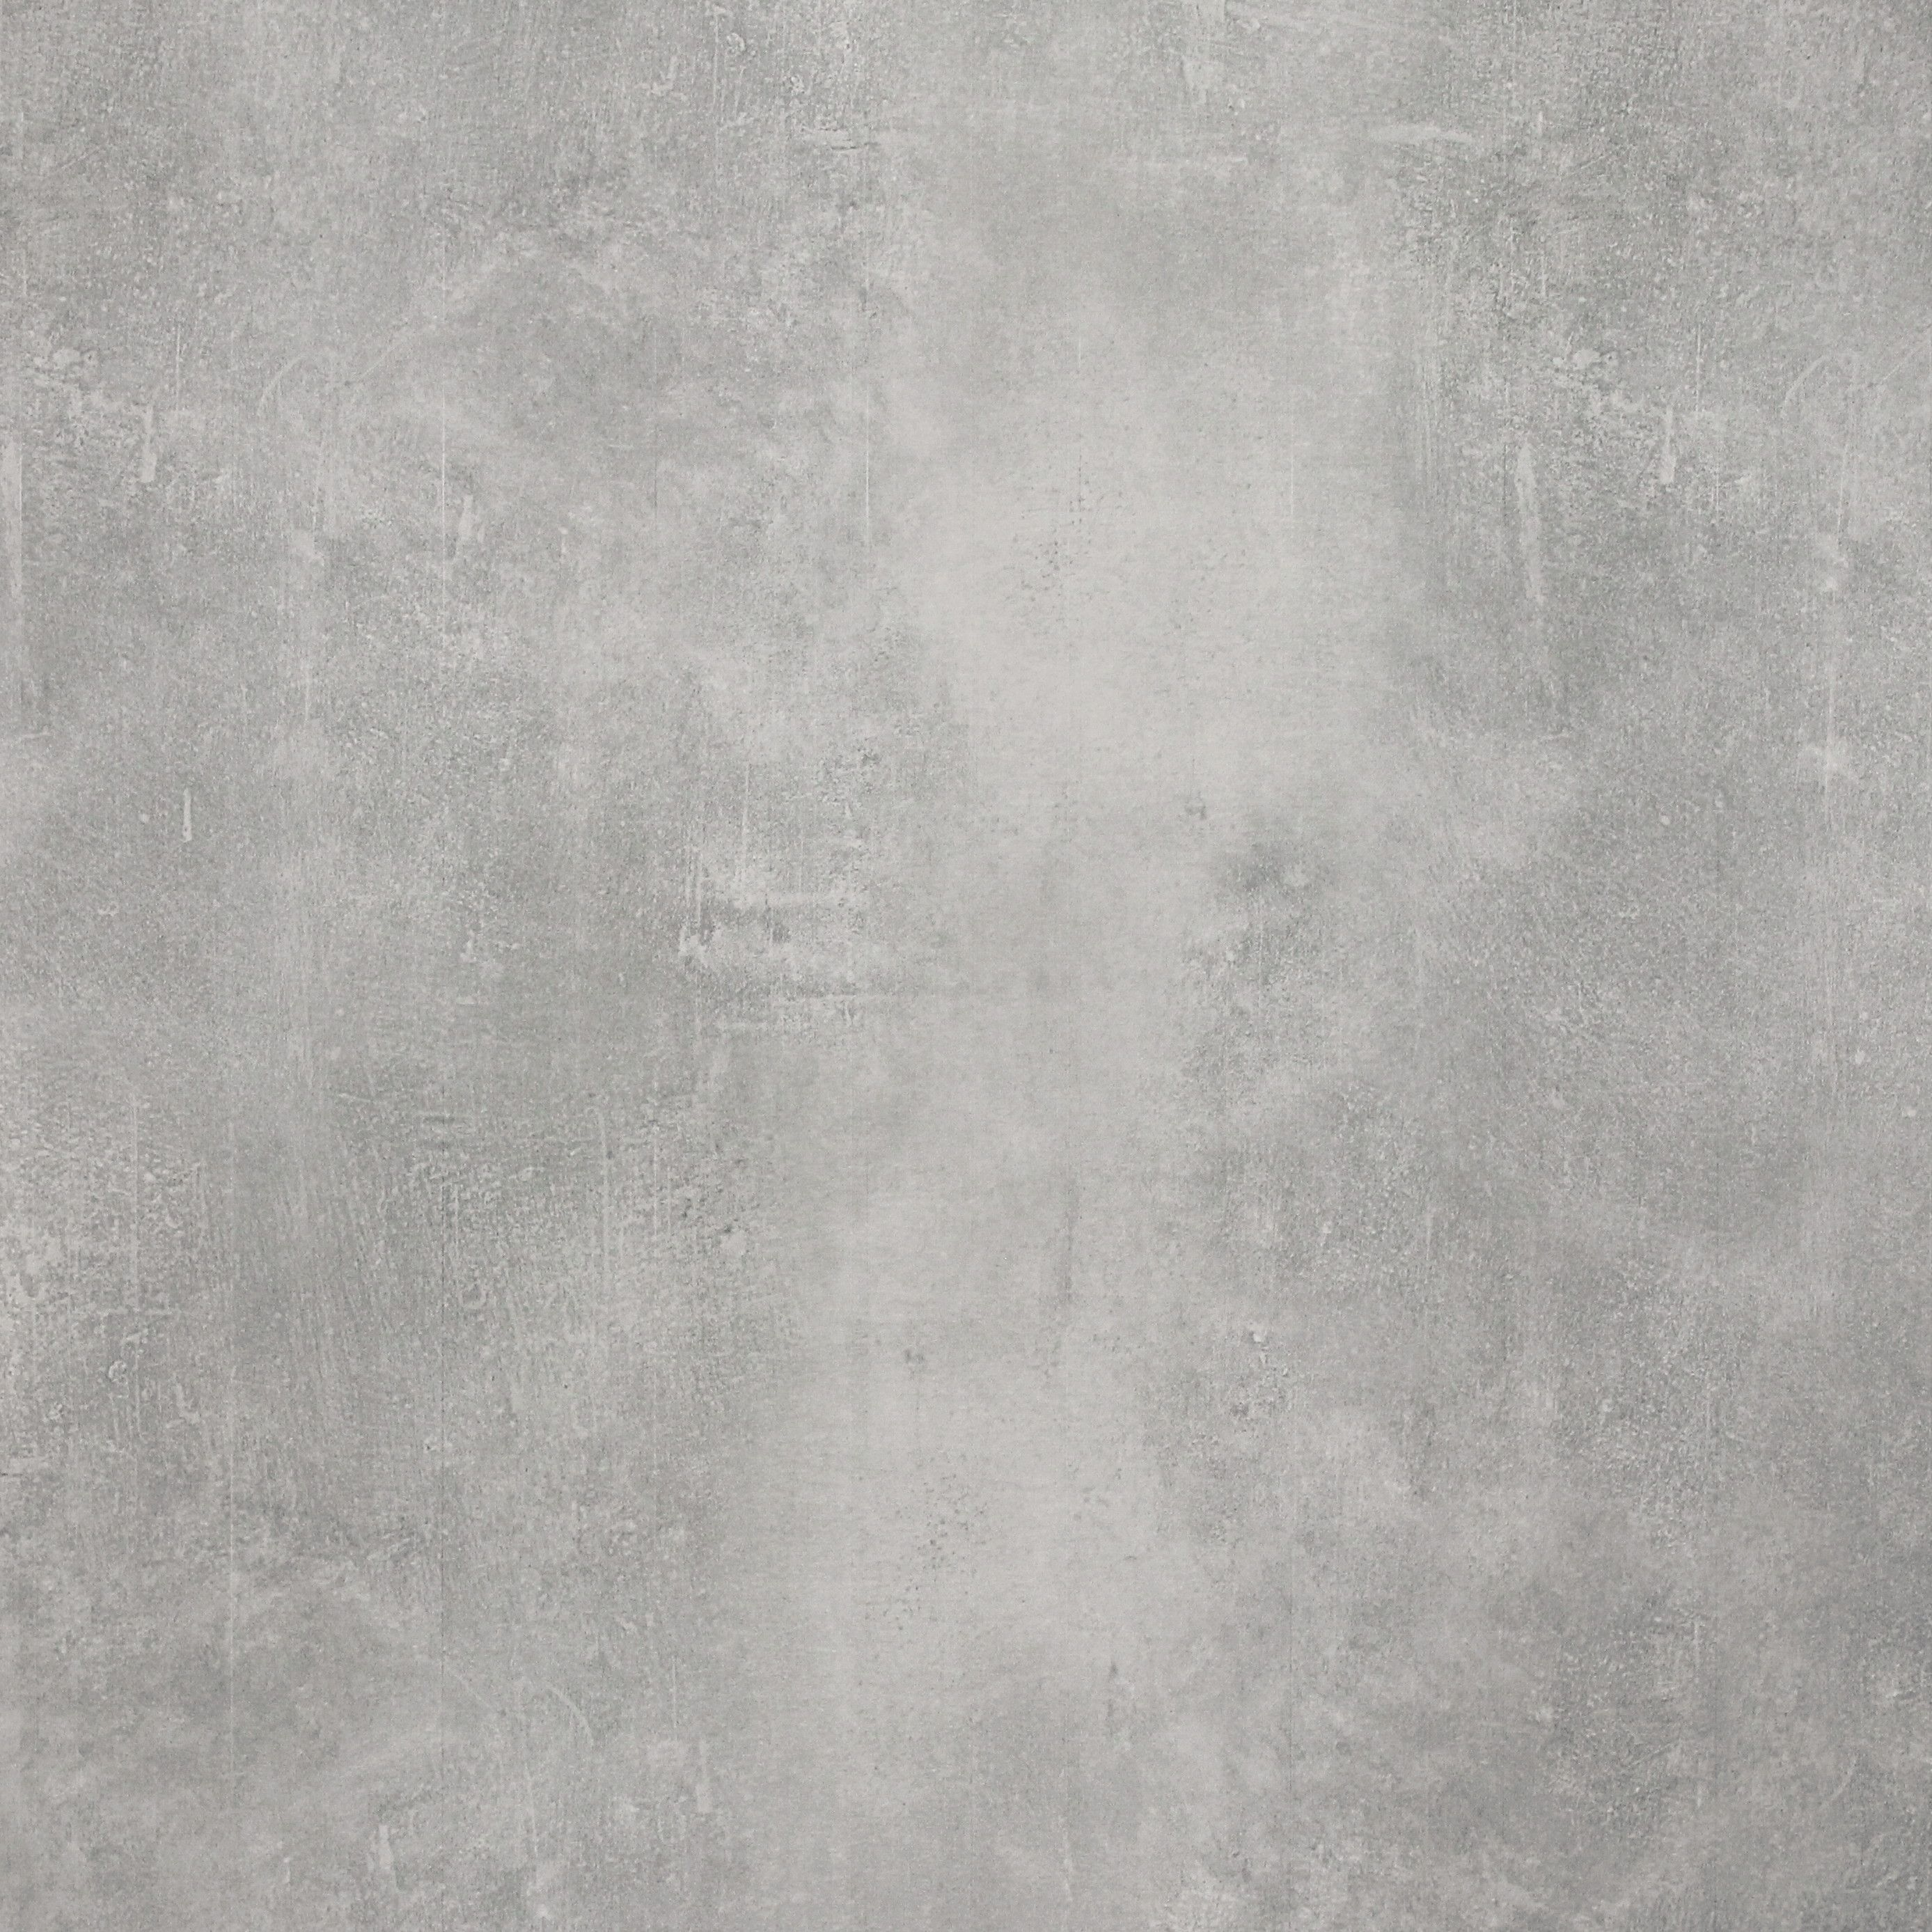 fkeu beton grau bodenfliese 60x60 cm r9 art nr fkeu0990369 fliesen in betonoptik. Black Bedroom Furniture Sets. Home Design Ideas